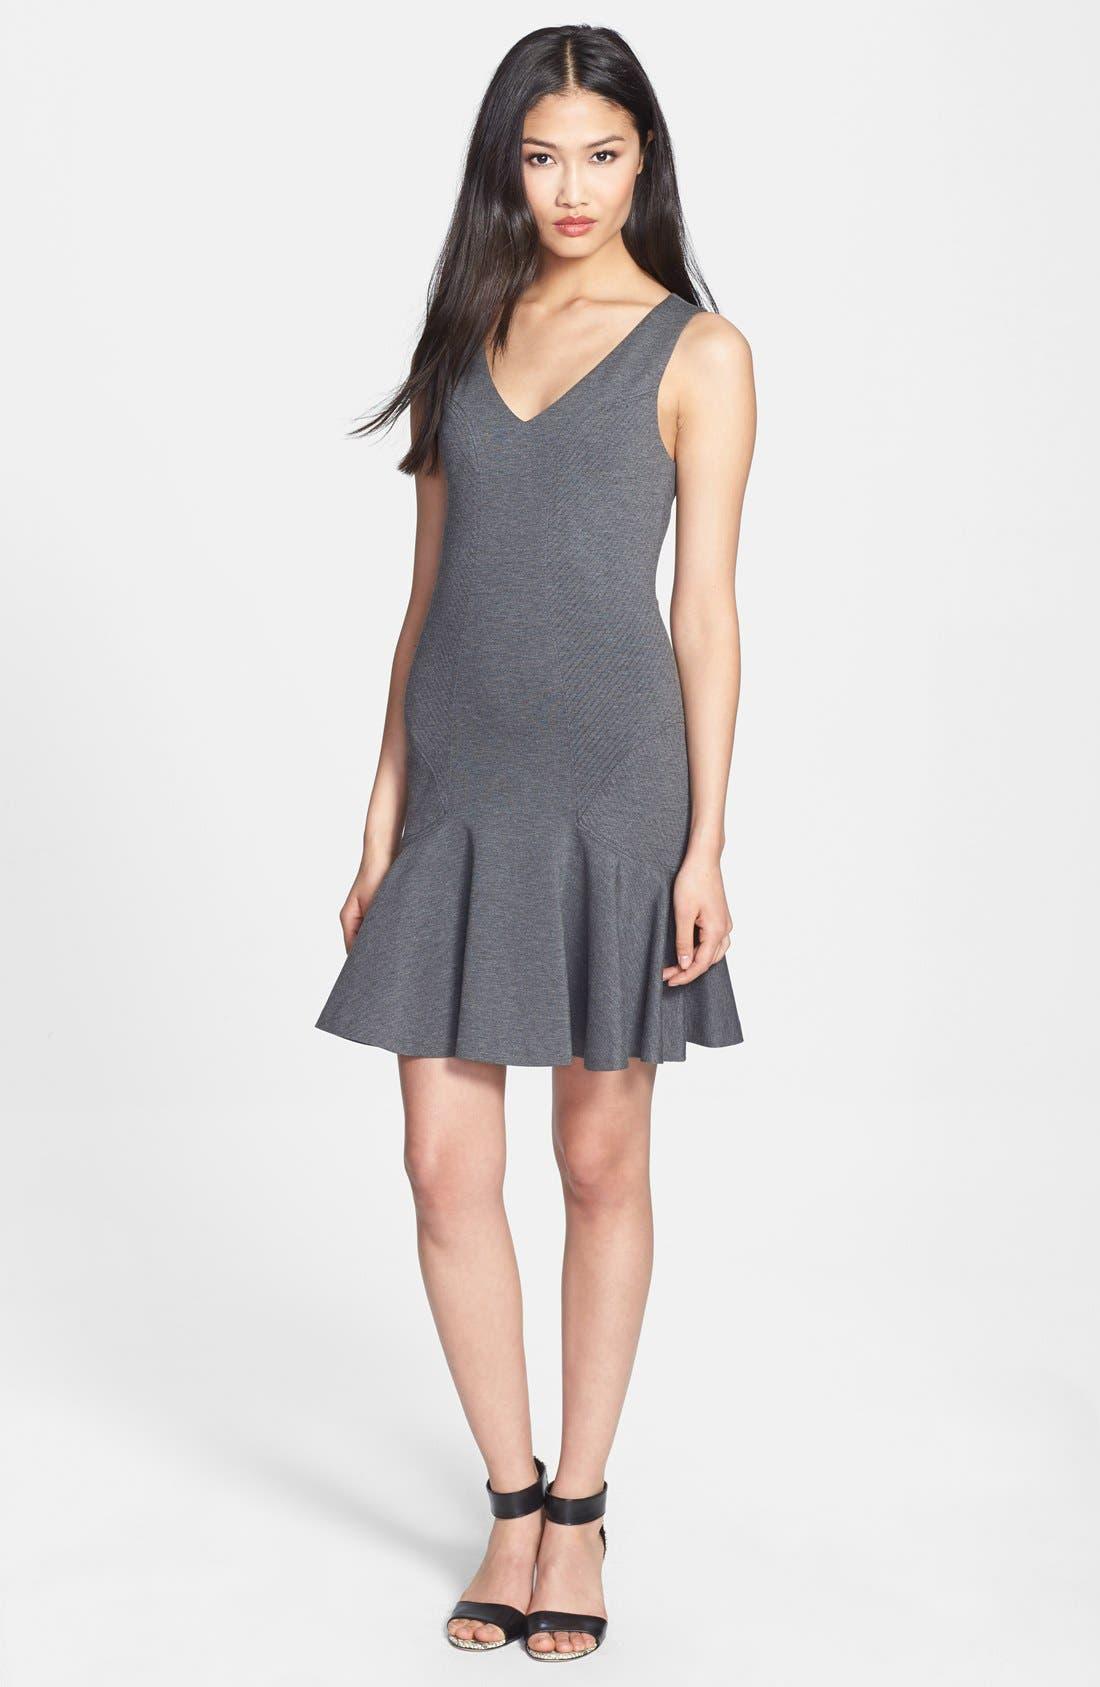 Alternate Image 1 Selected - Diane von Furstenberg 'Carla' Knit Sheath Dress